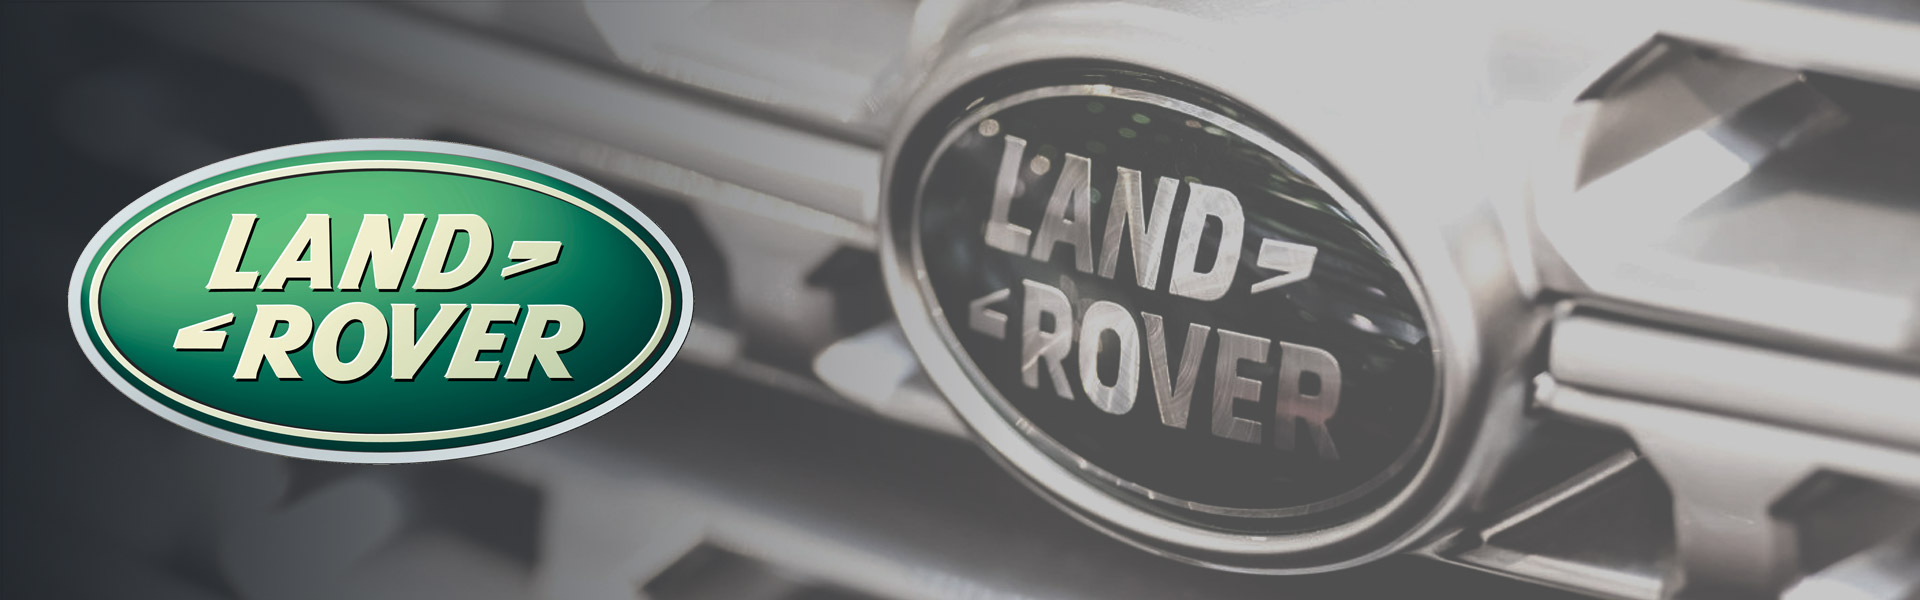 Land Rover Car Servicing Rotherham